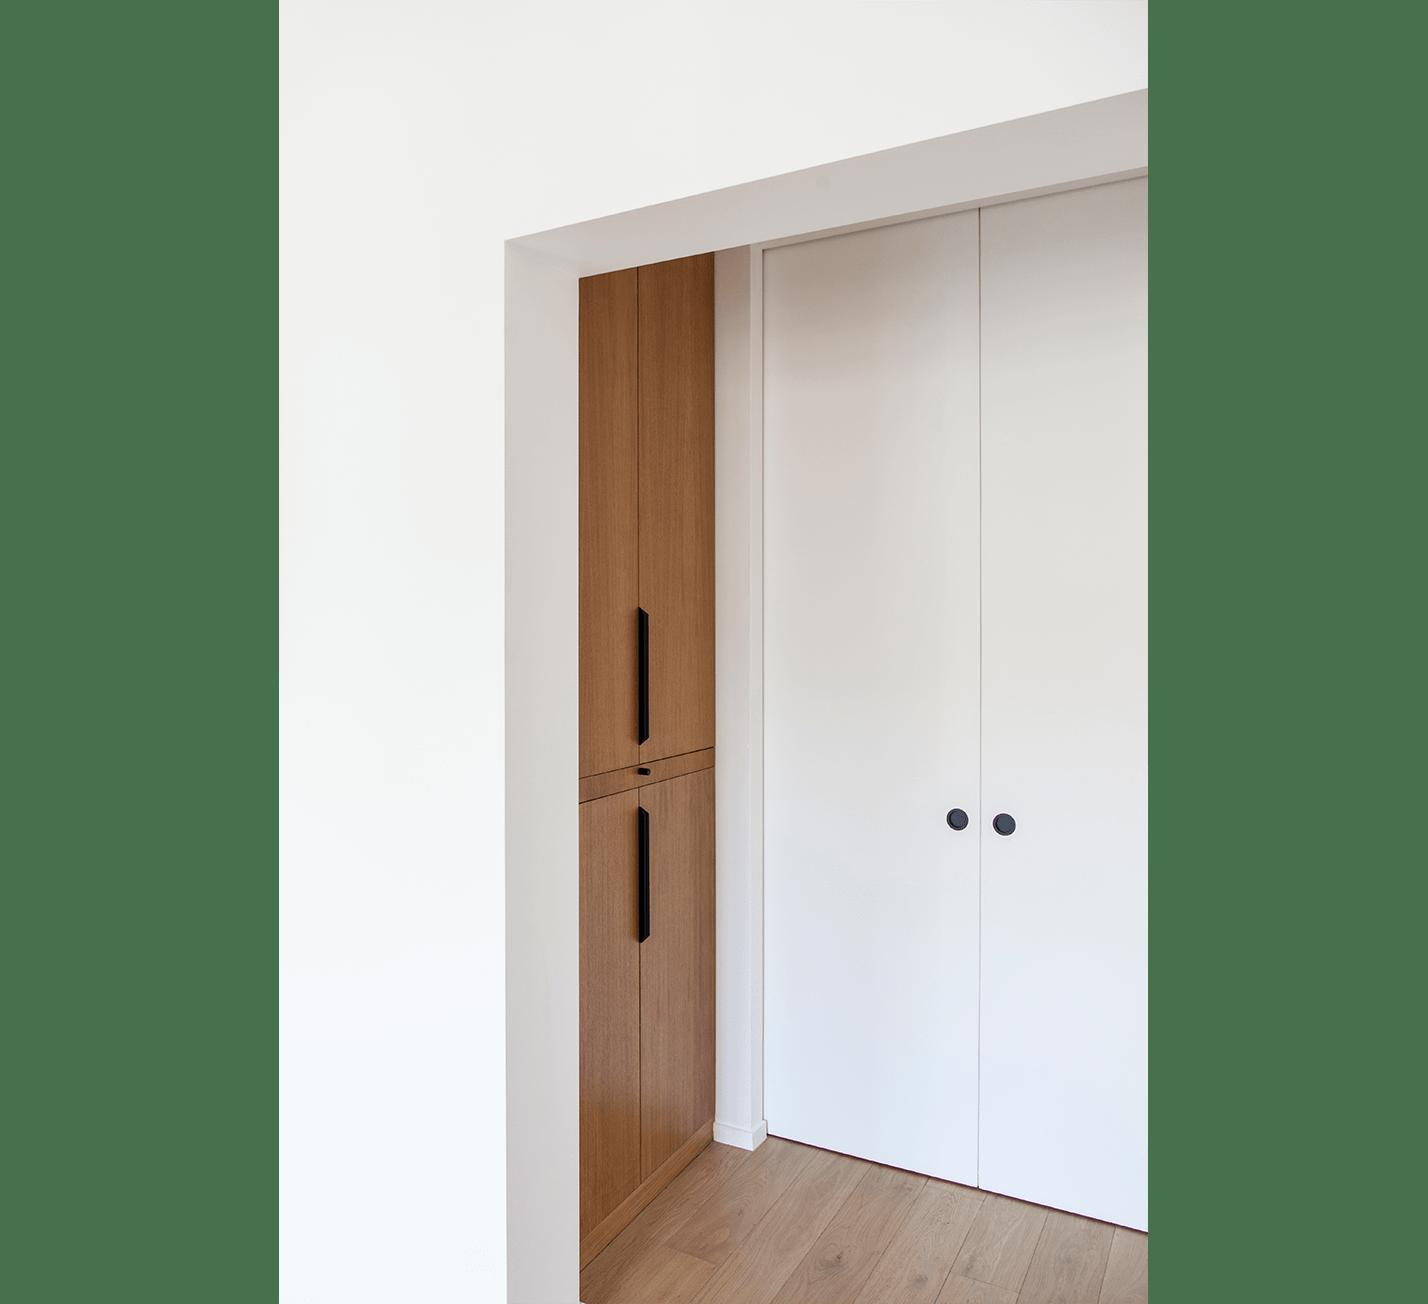 Projet-Arlequin-Atelier-Steve-Pauline-Borgia-Architecture-interieur-14-min